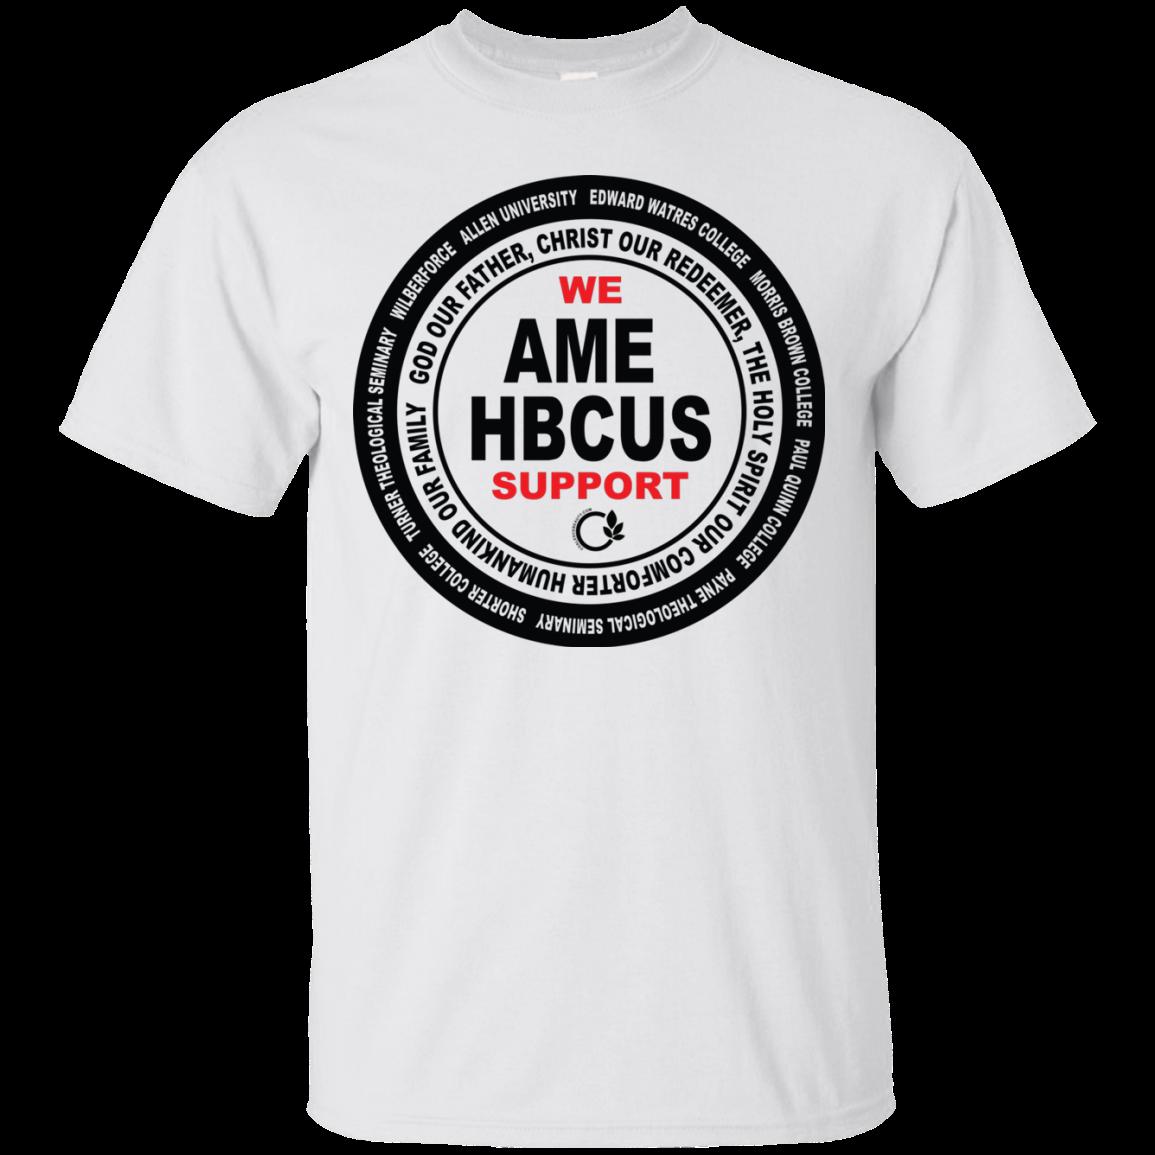 AME HBCU'S Tops